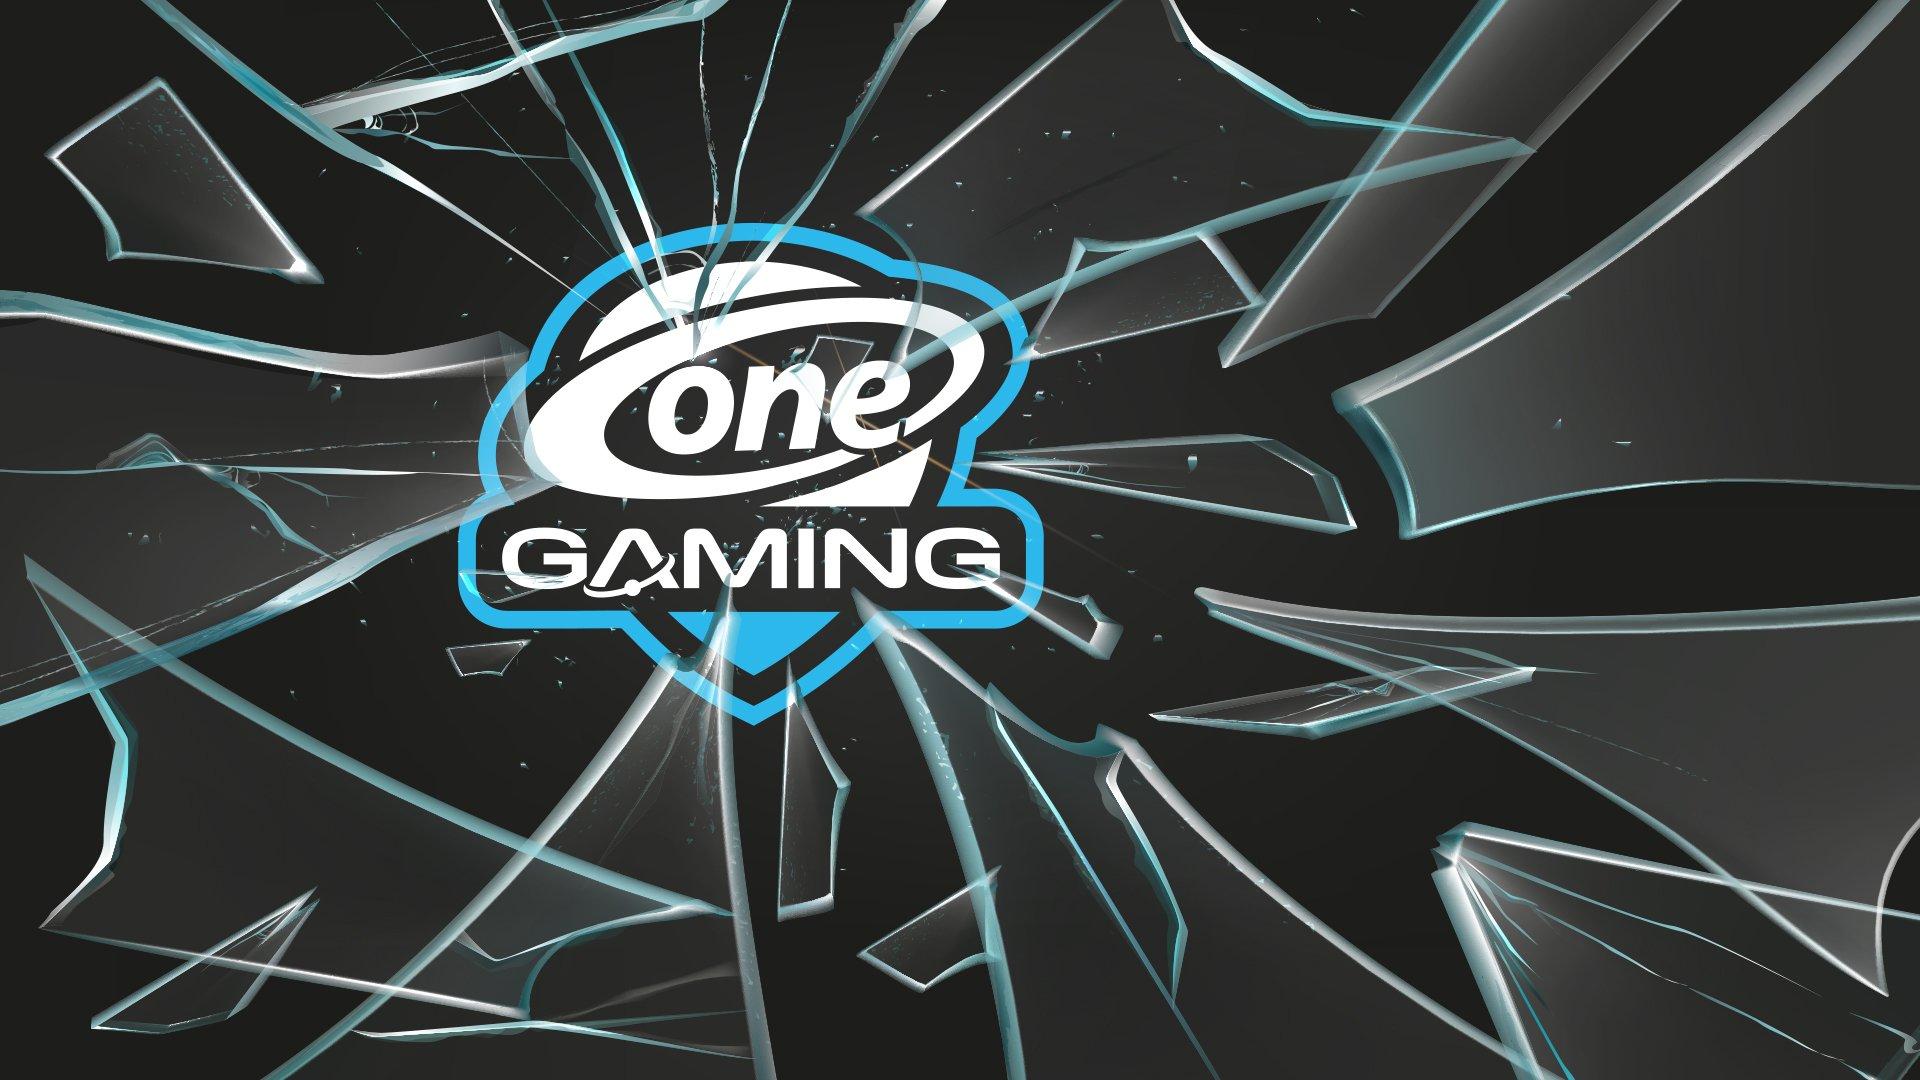 ONE Gaming Wallpaper Break